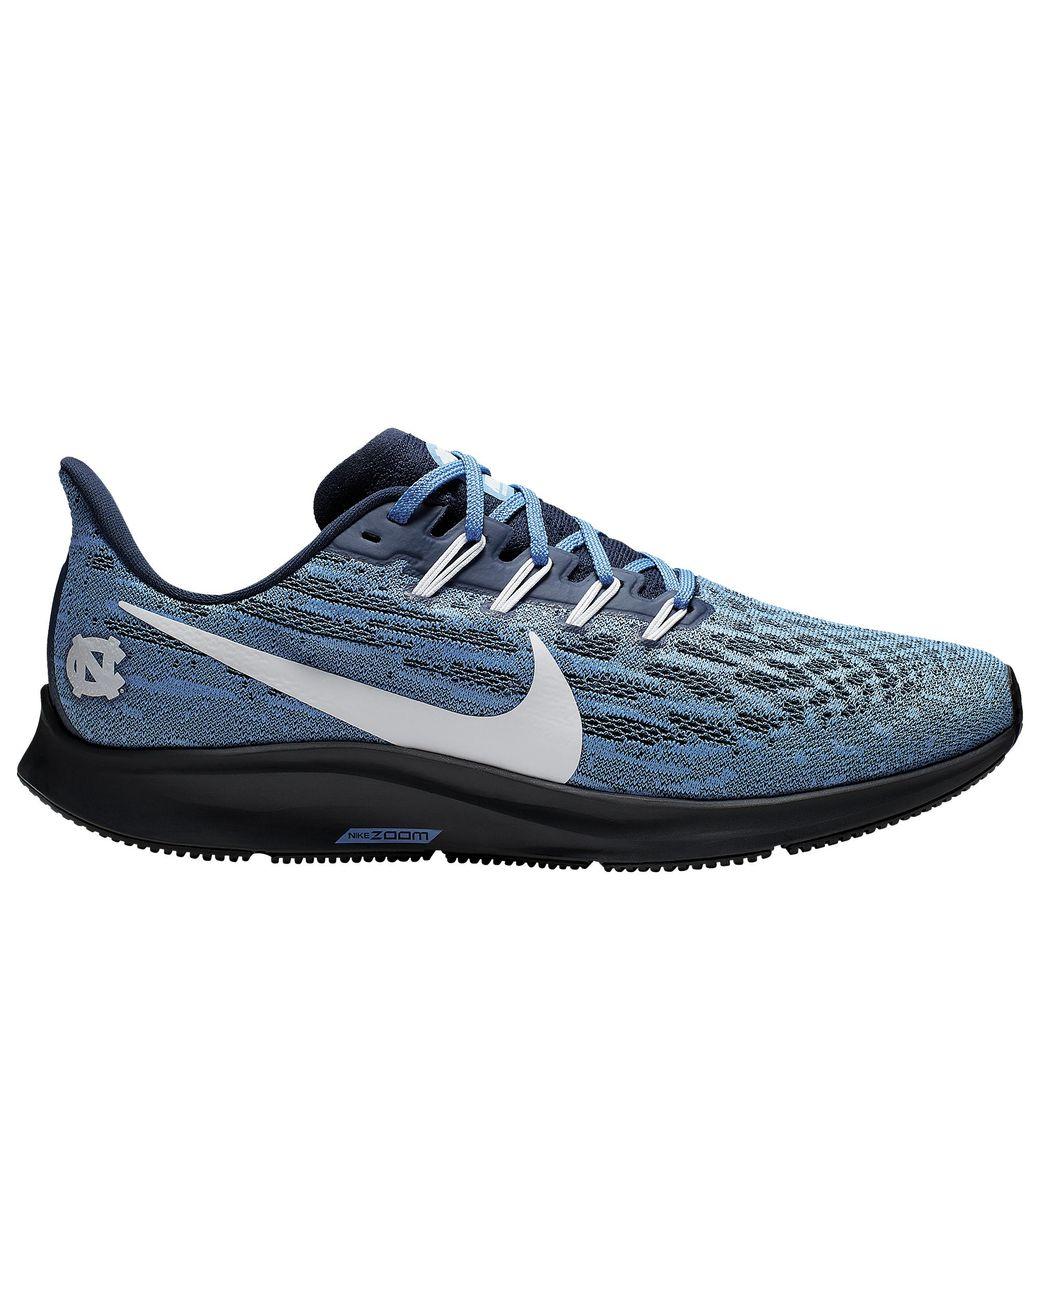 Air Zoom Pegasus 36 Ncaa Running Shoes